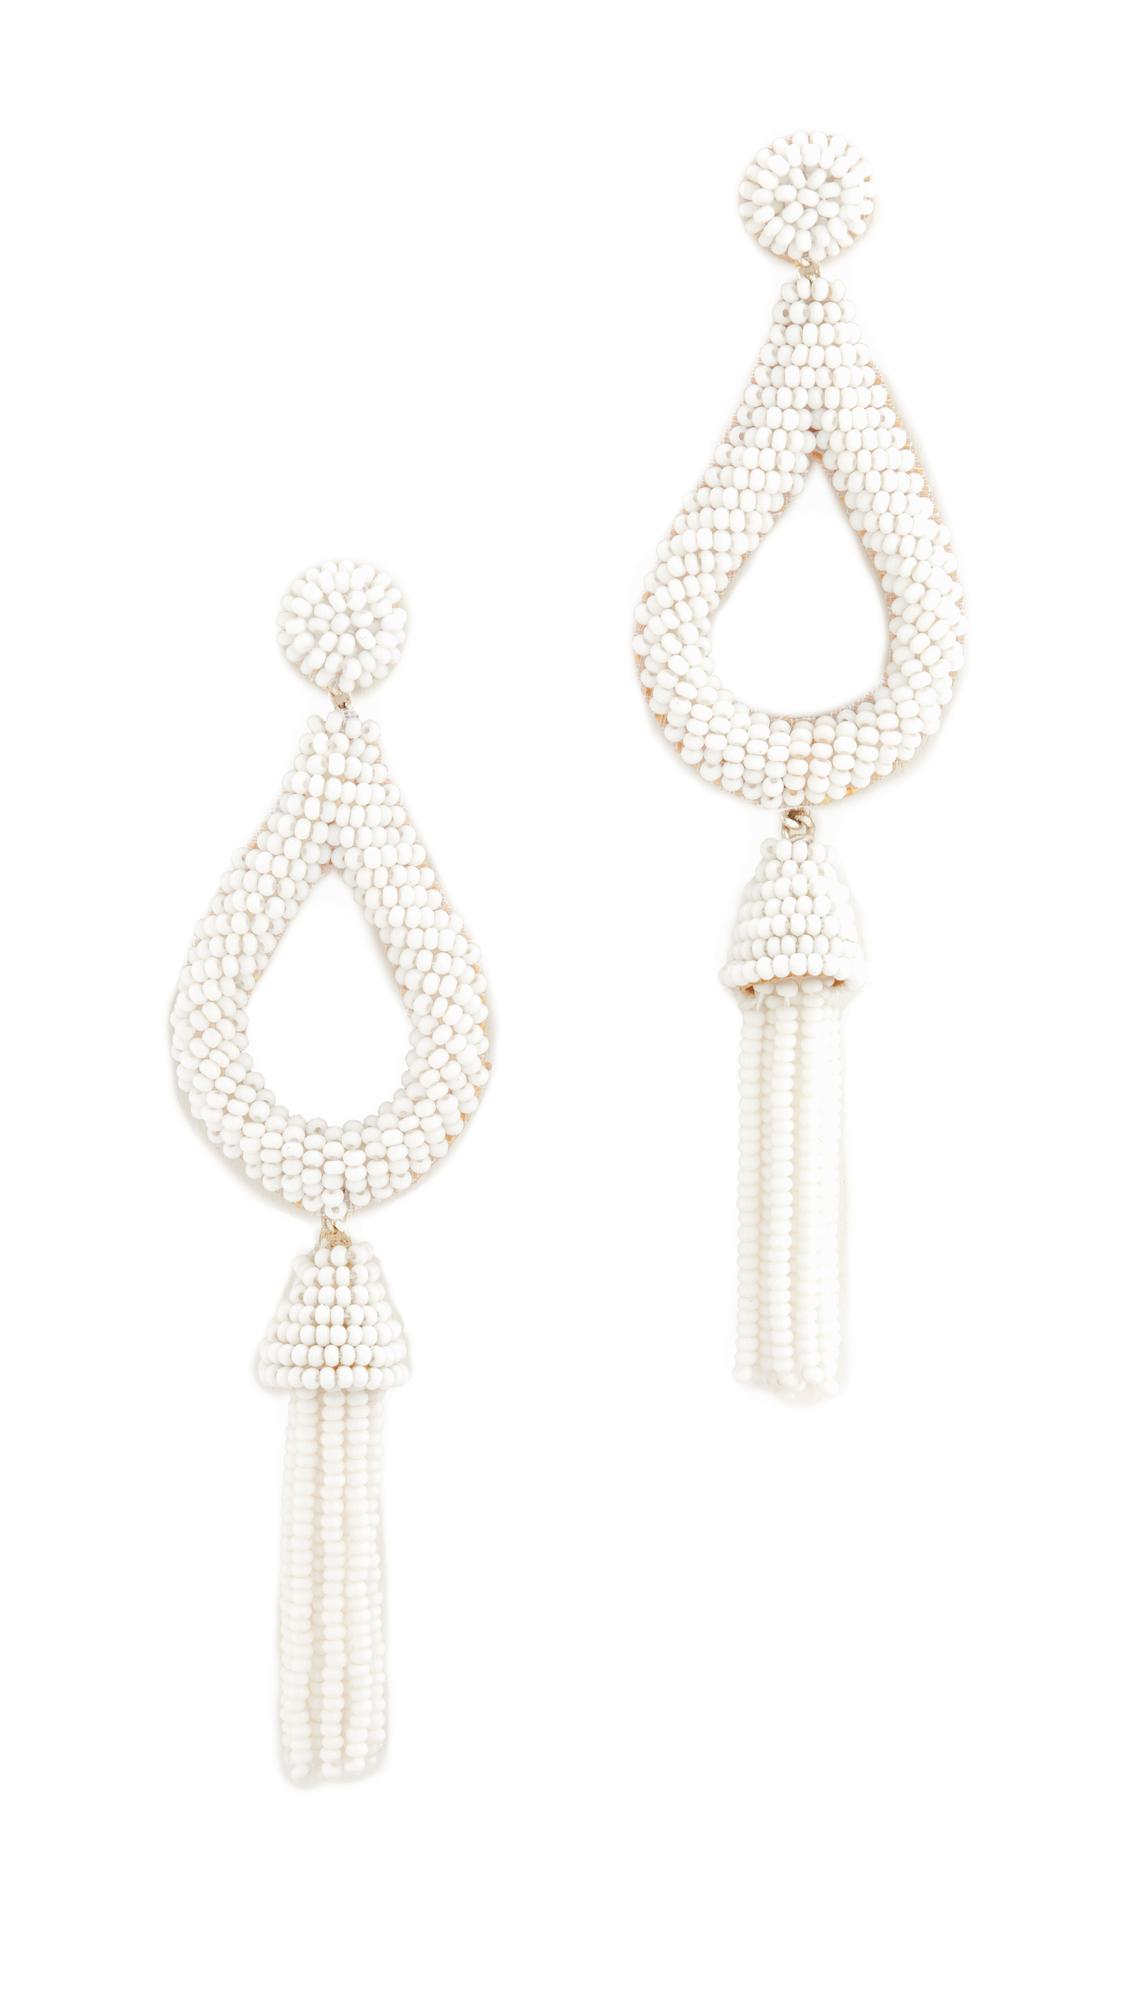 Deepa Gurnani Deepa by Deepa Gurnani Layla Earrings - White